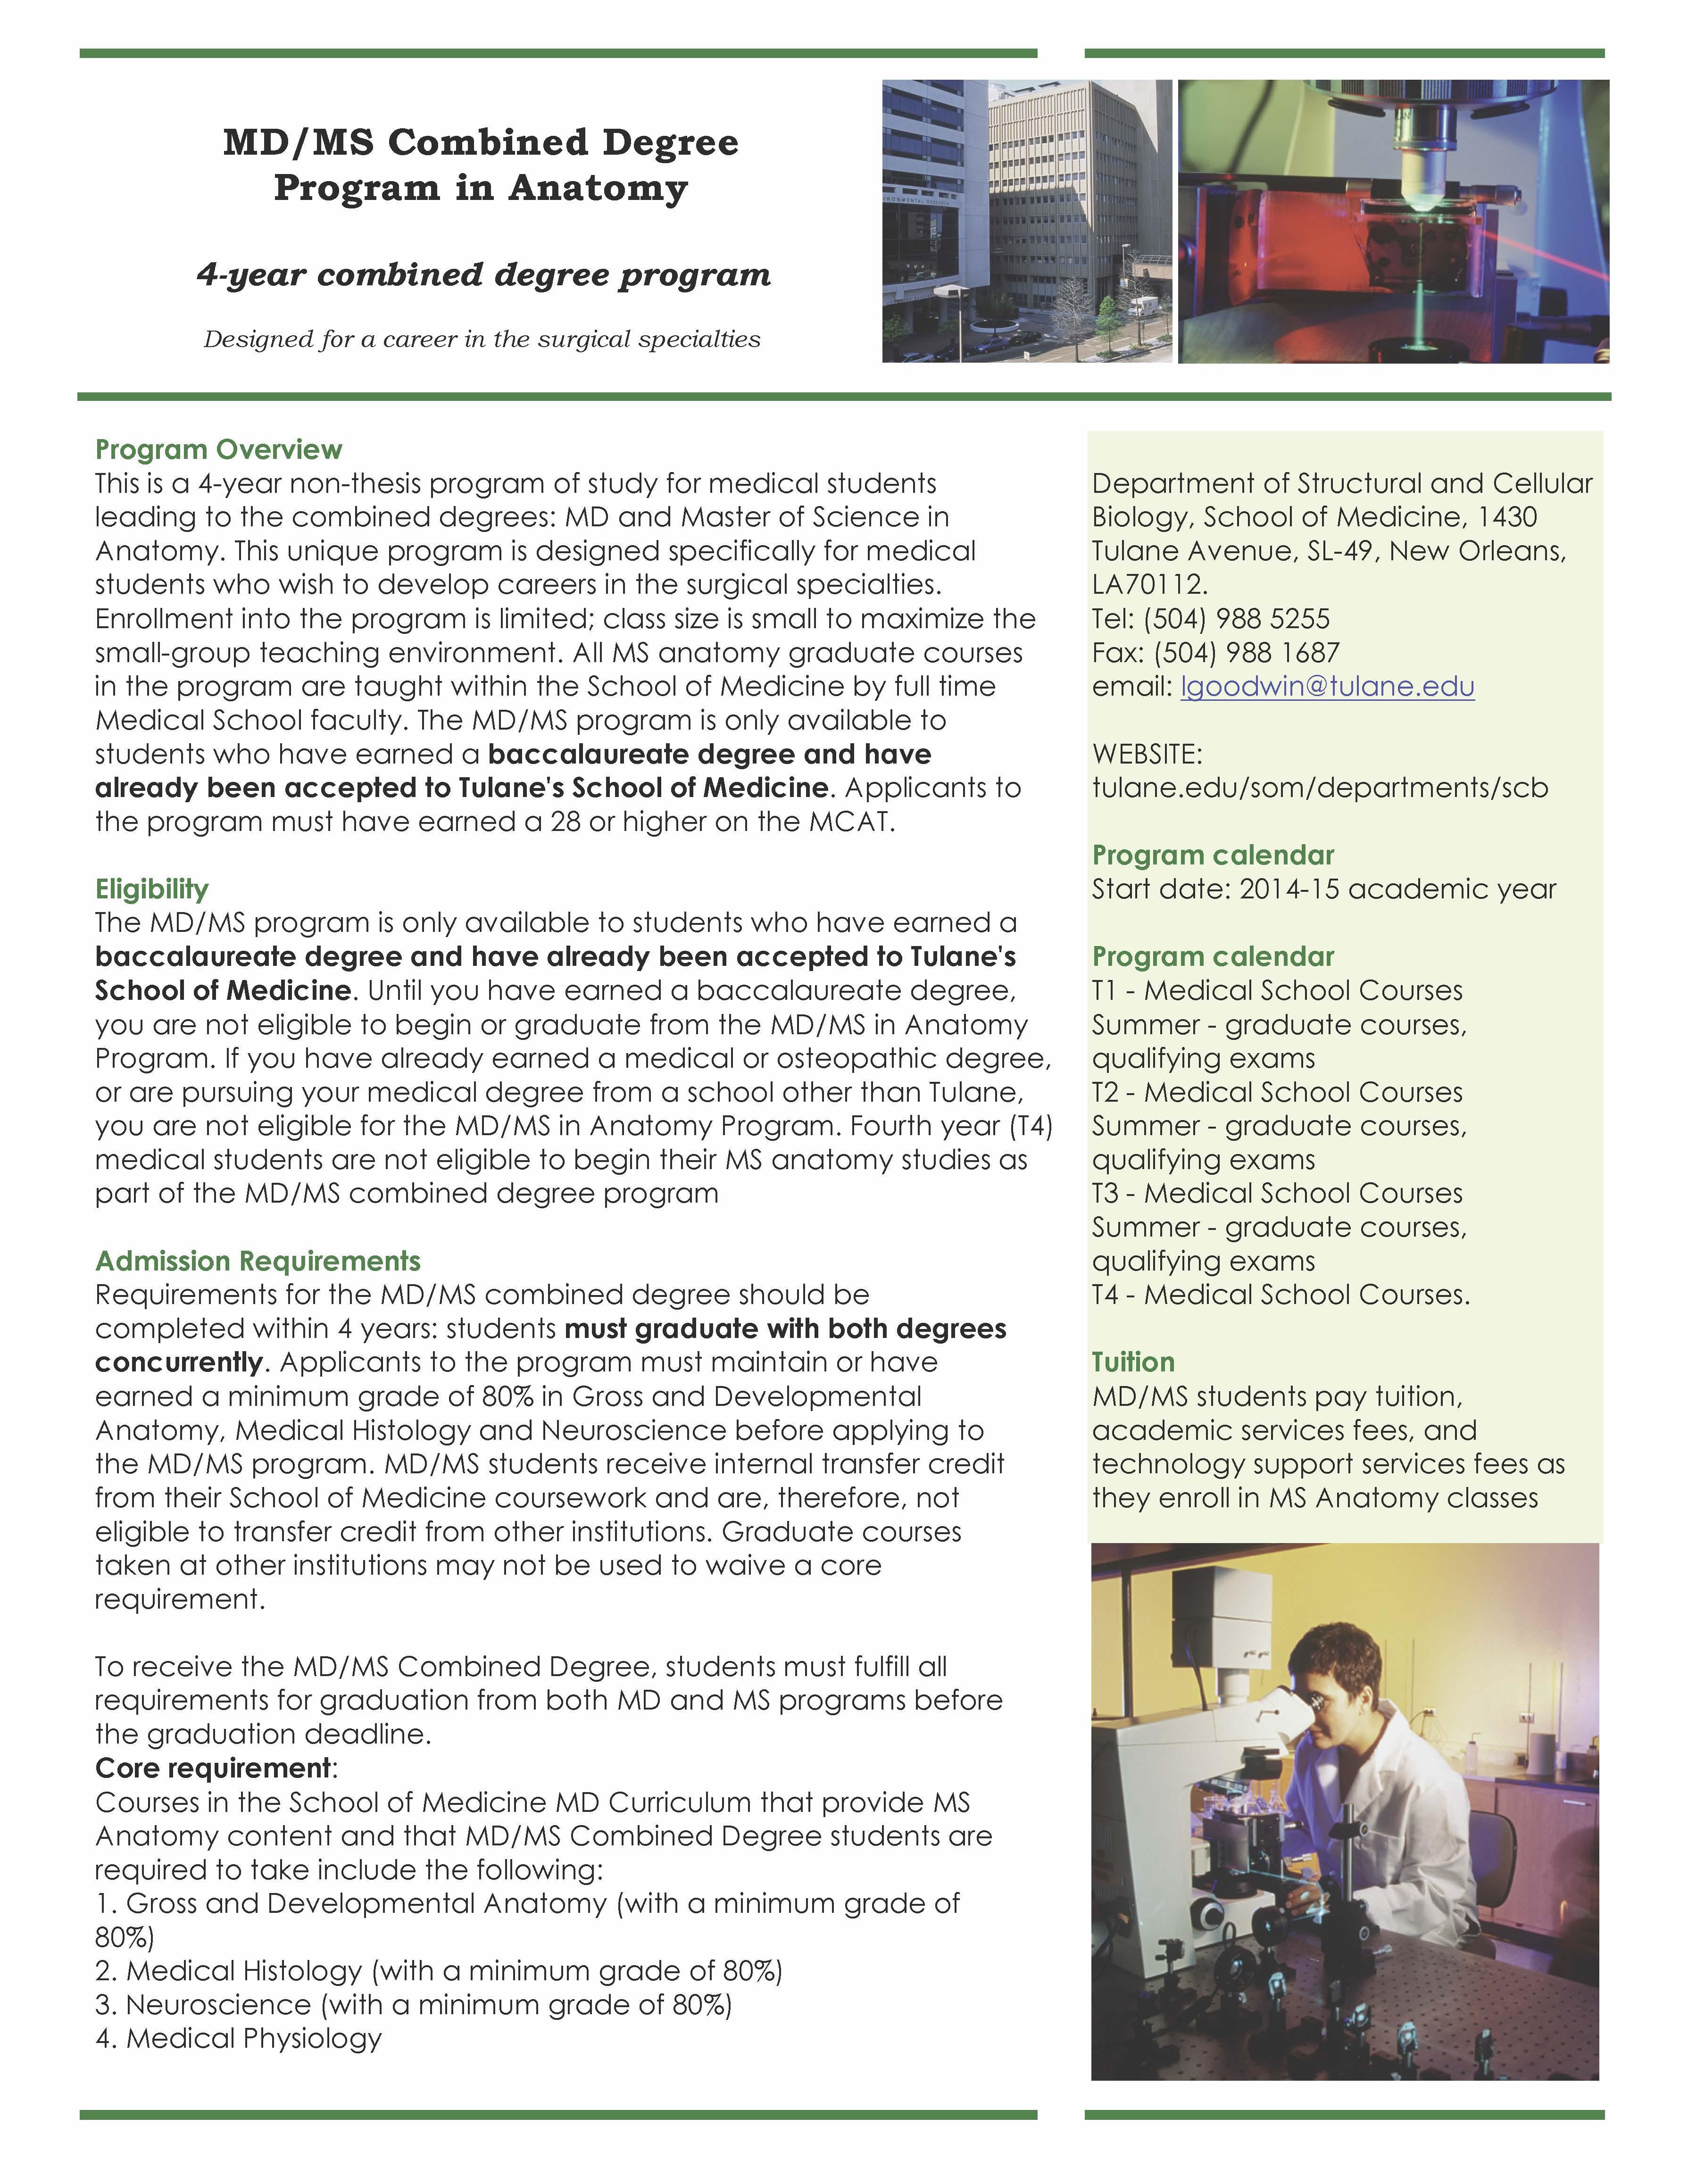 Tulane University Medical School – Master of Science Program in ...